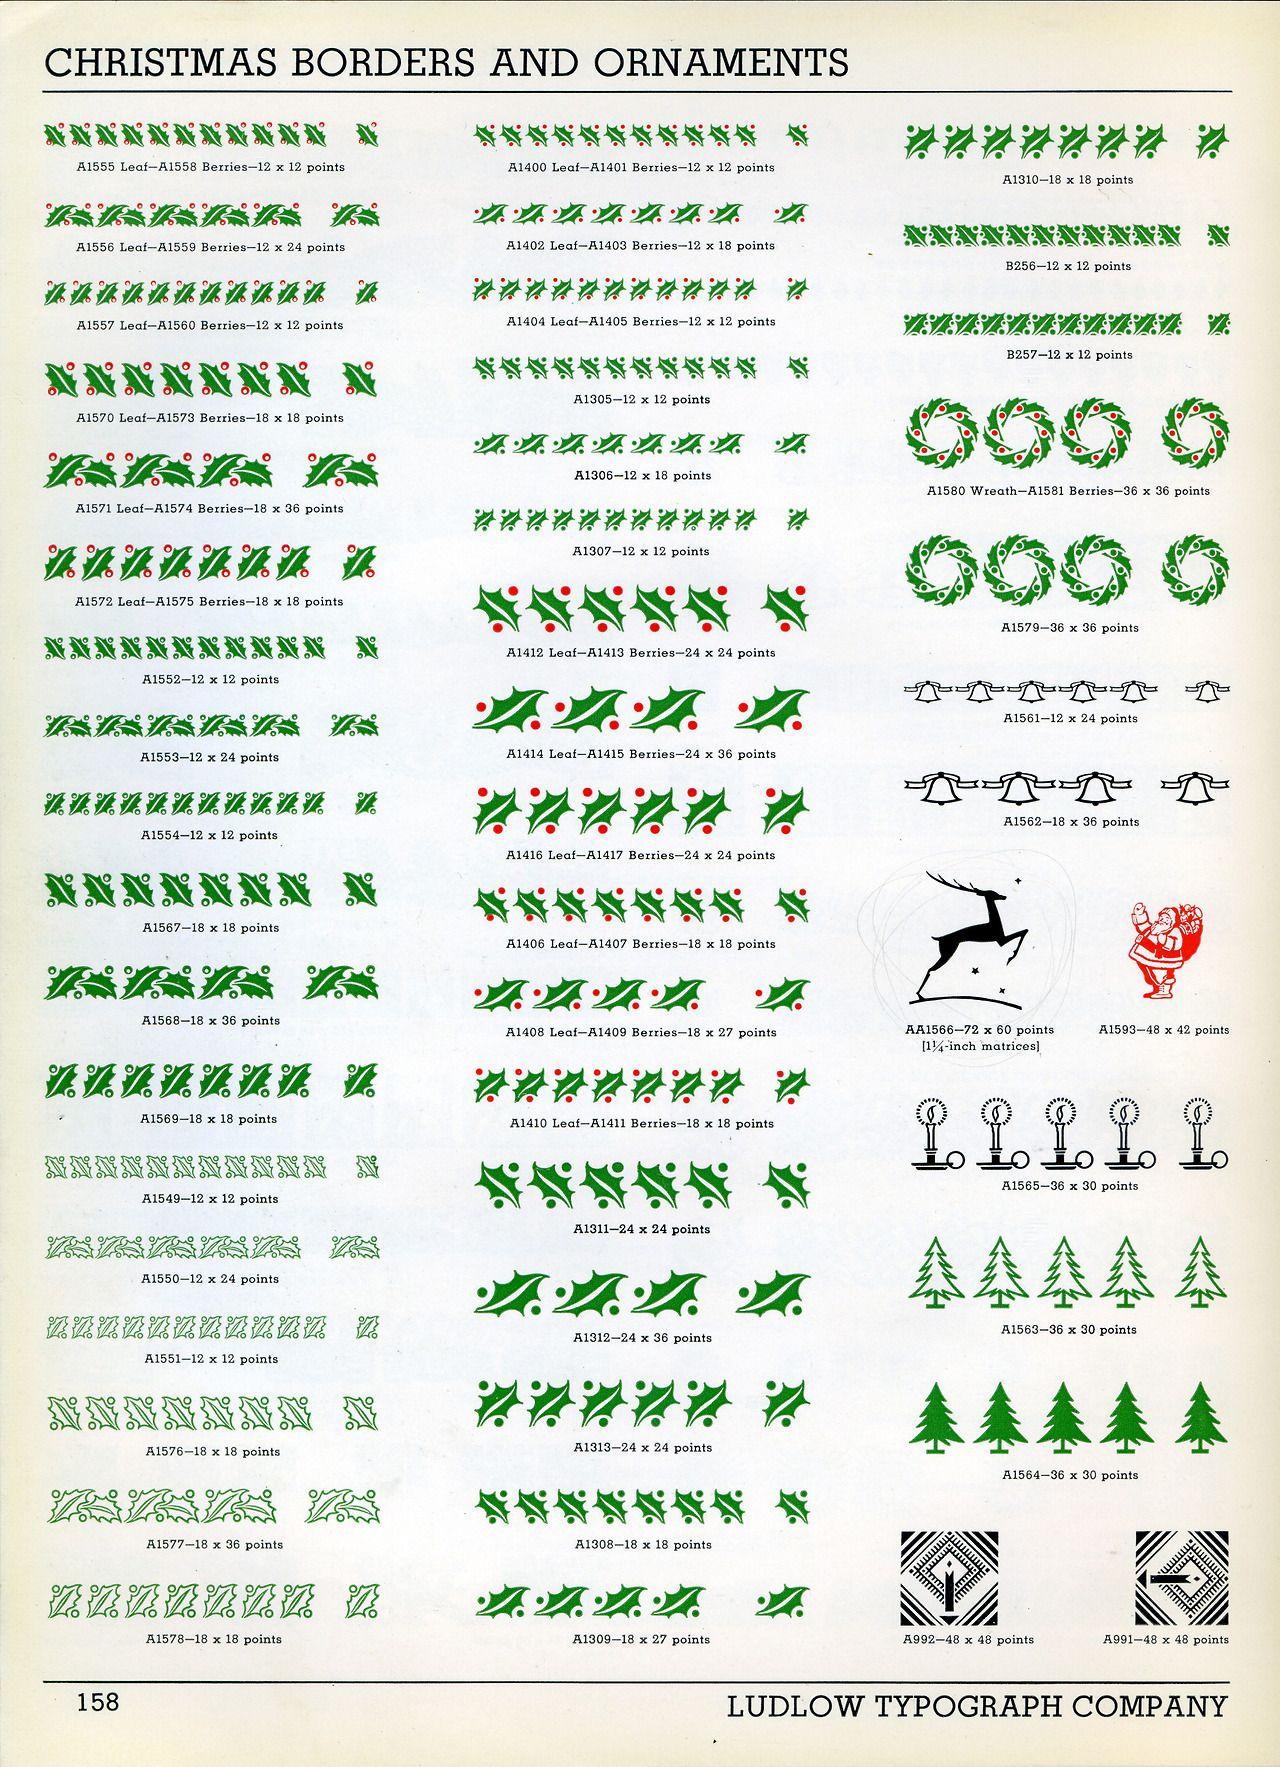 Ludlow Christmas Ornaments Font